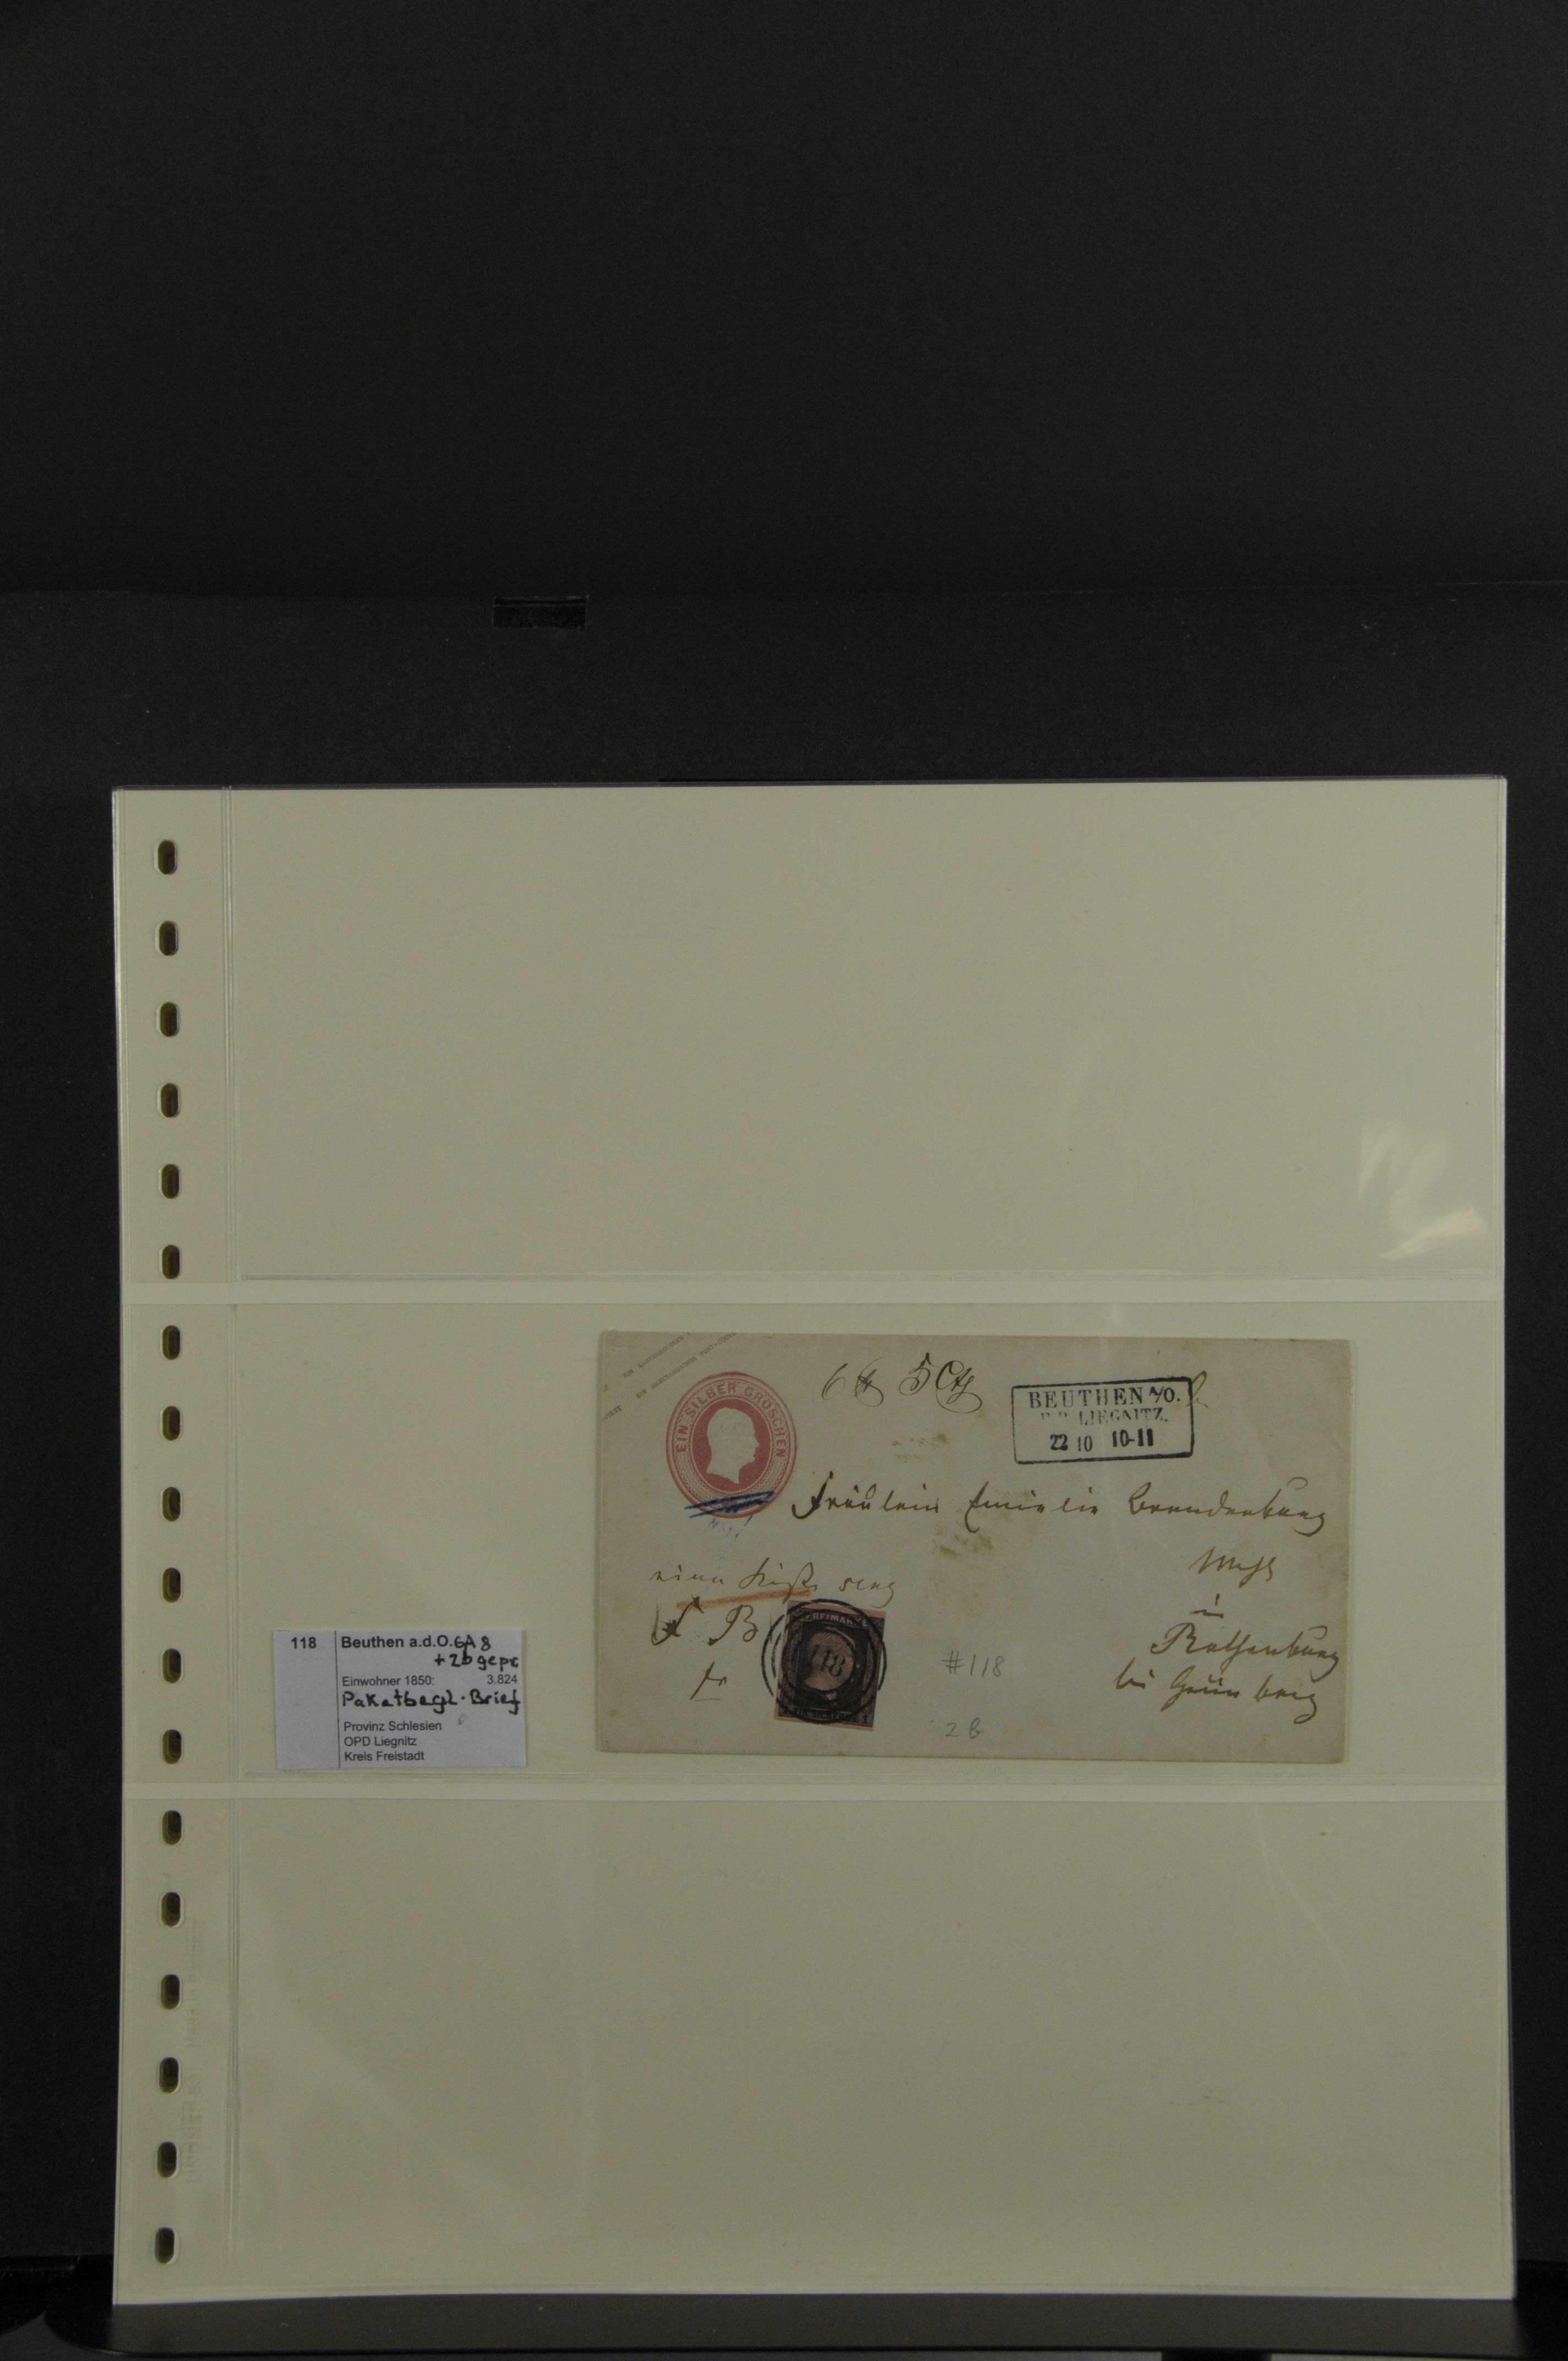 Lot 7858 - altdeutschland Preussen - Nummernstempel -  Auktionshaus Ulrich Felzmann GmbH & Co. KG